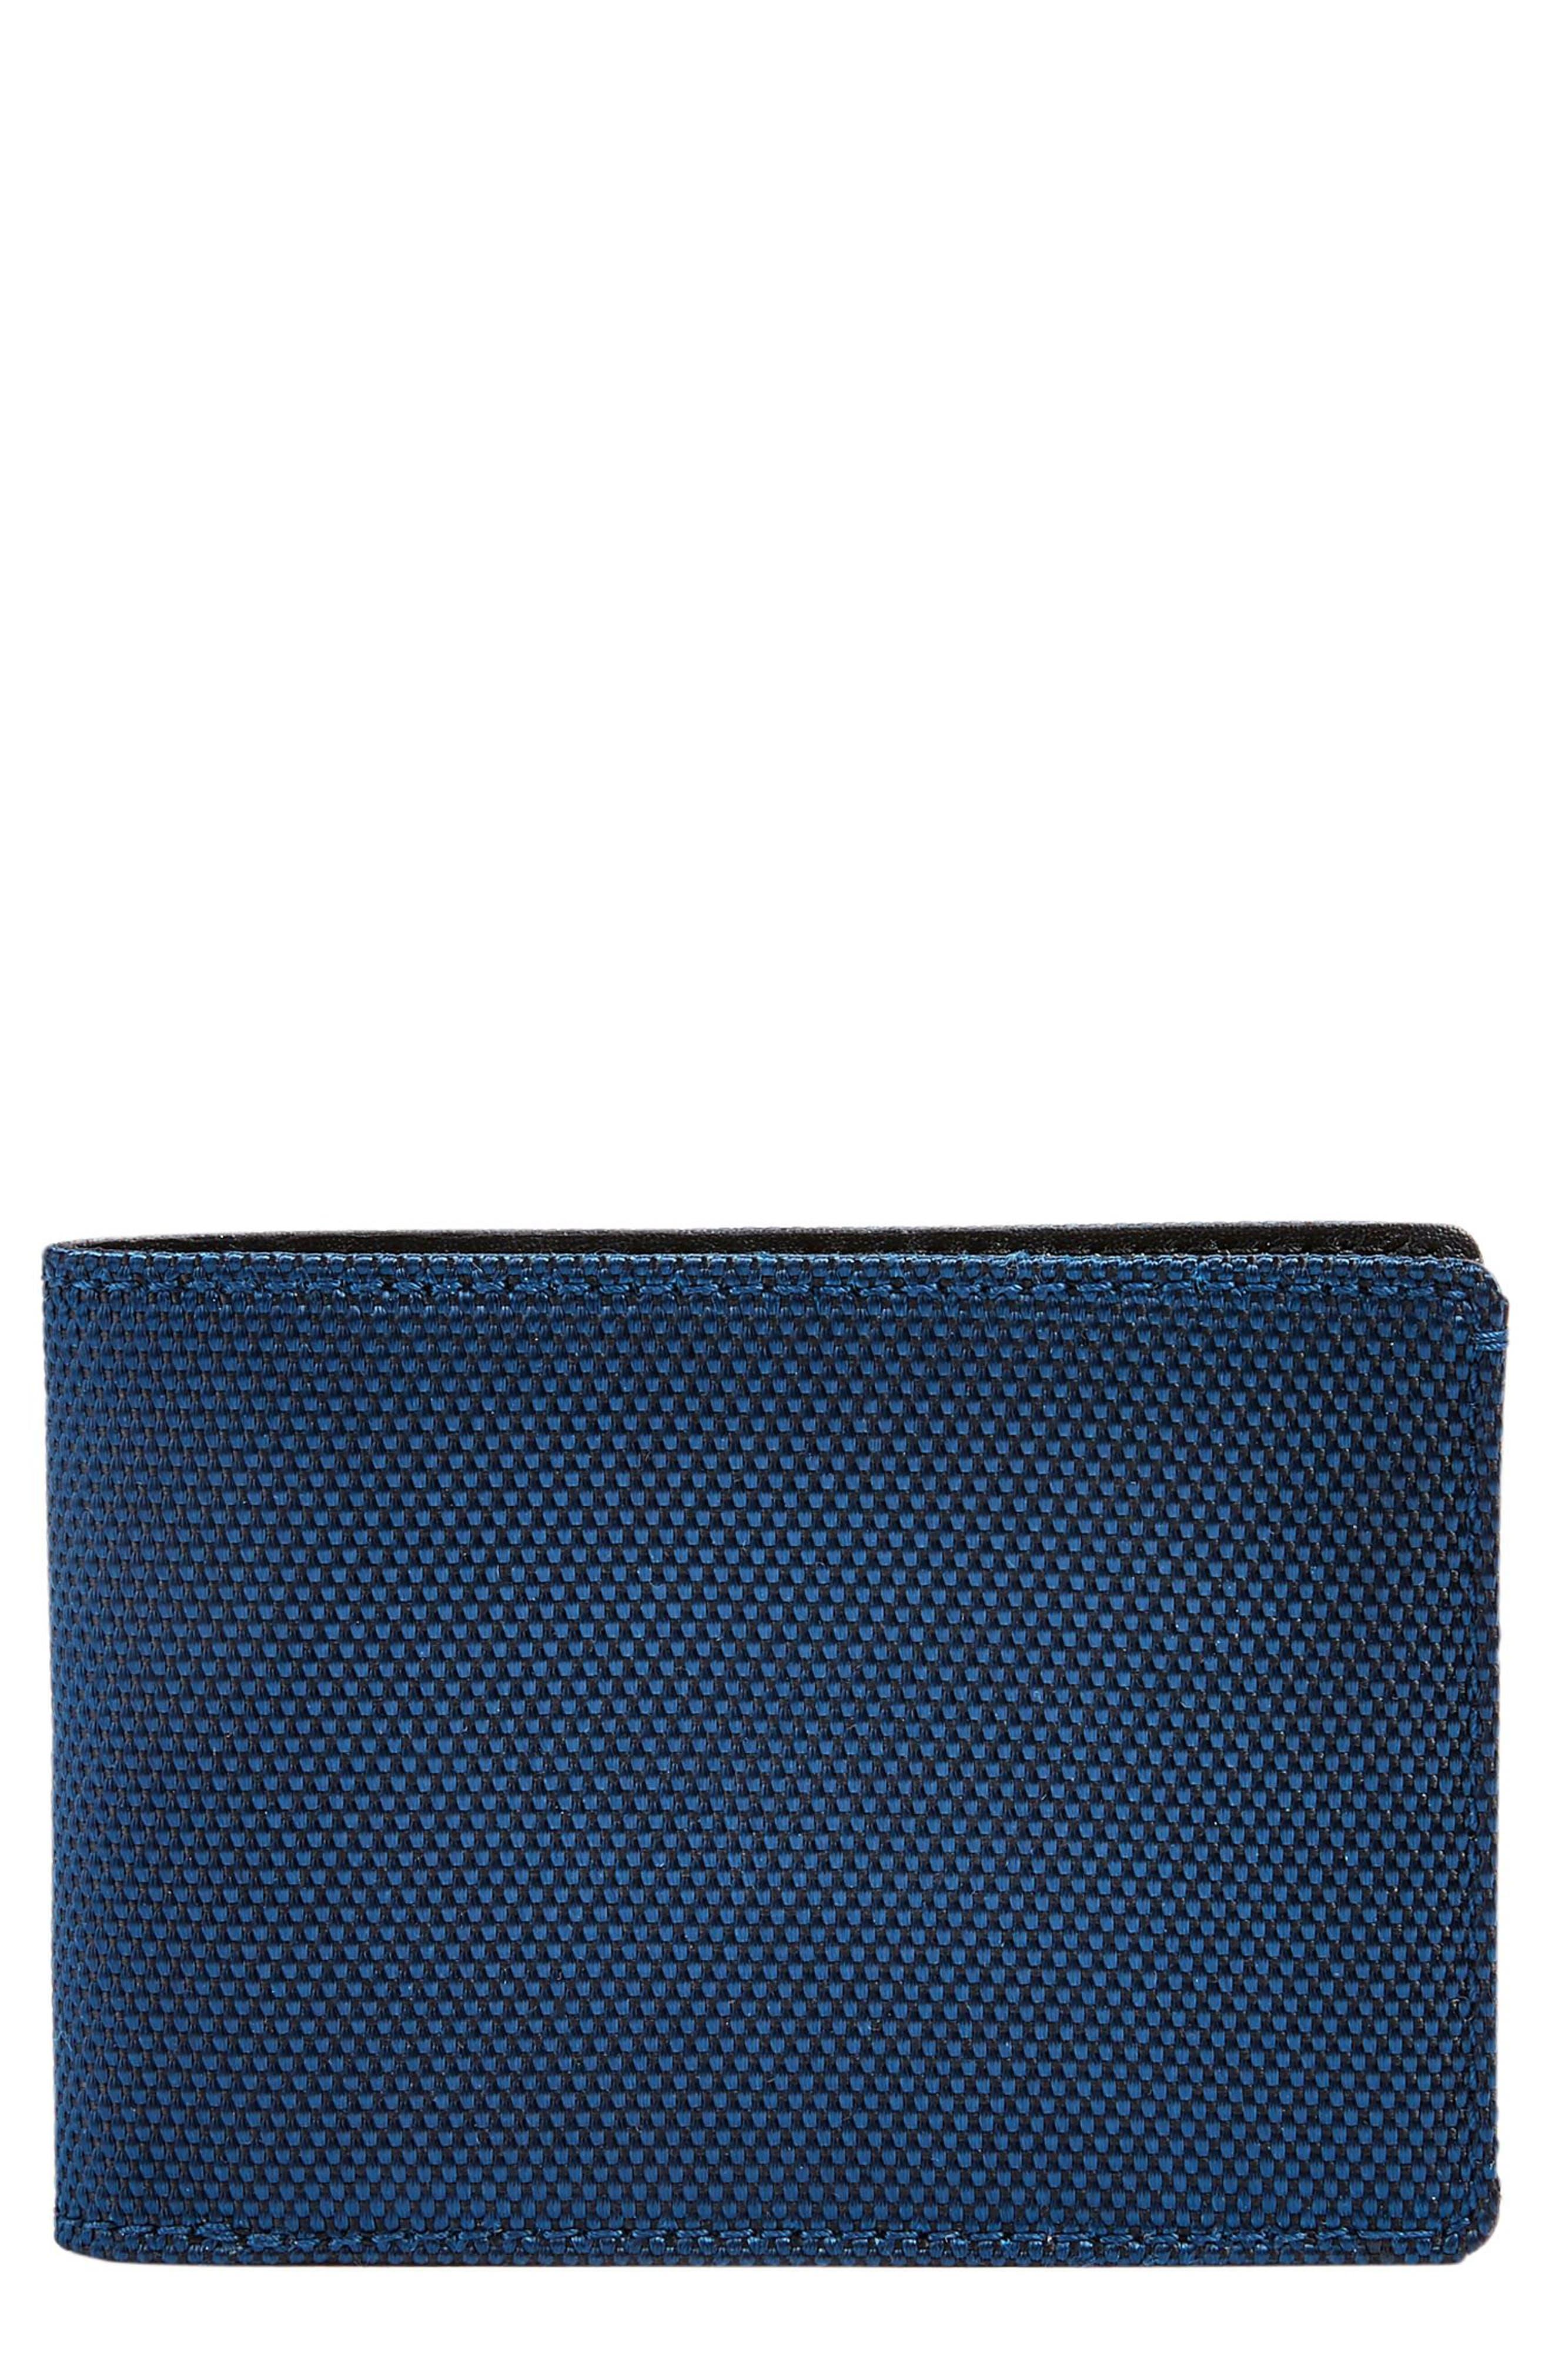 Main Image - Skagen Slim Bifold Wallet